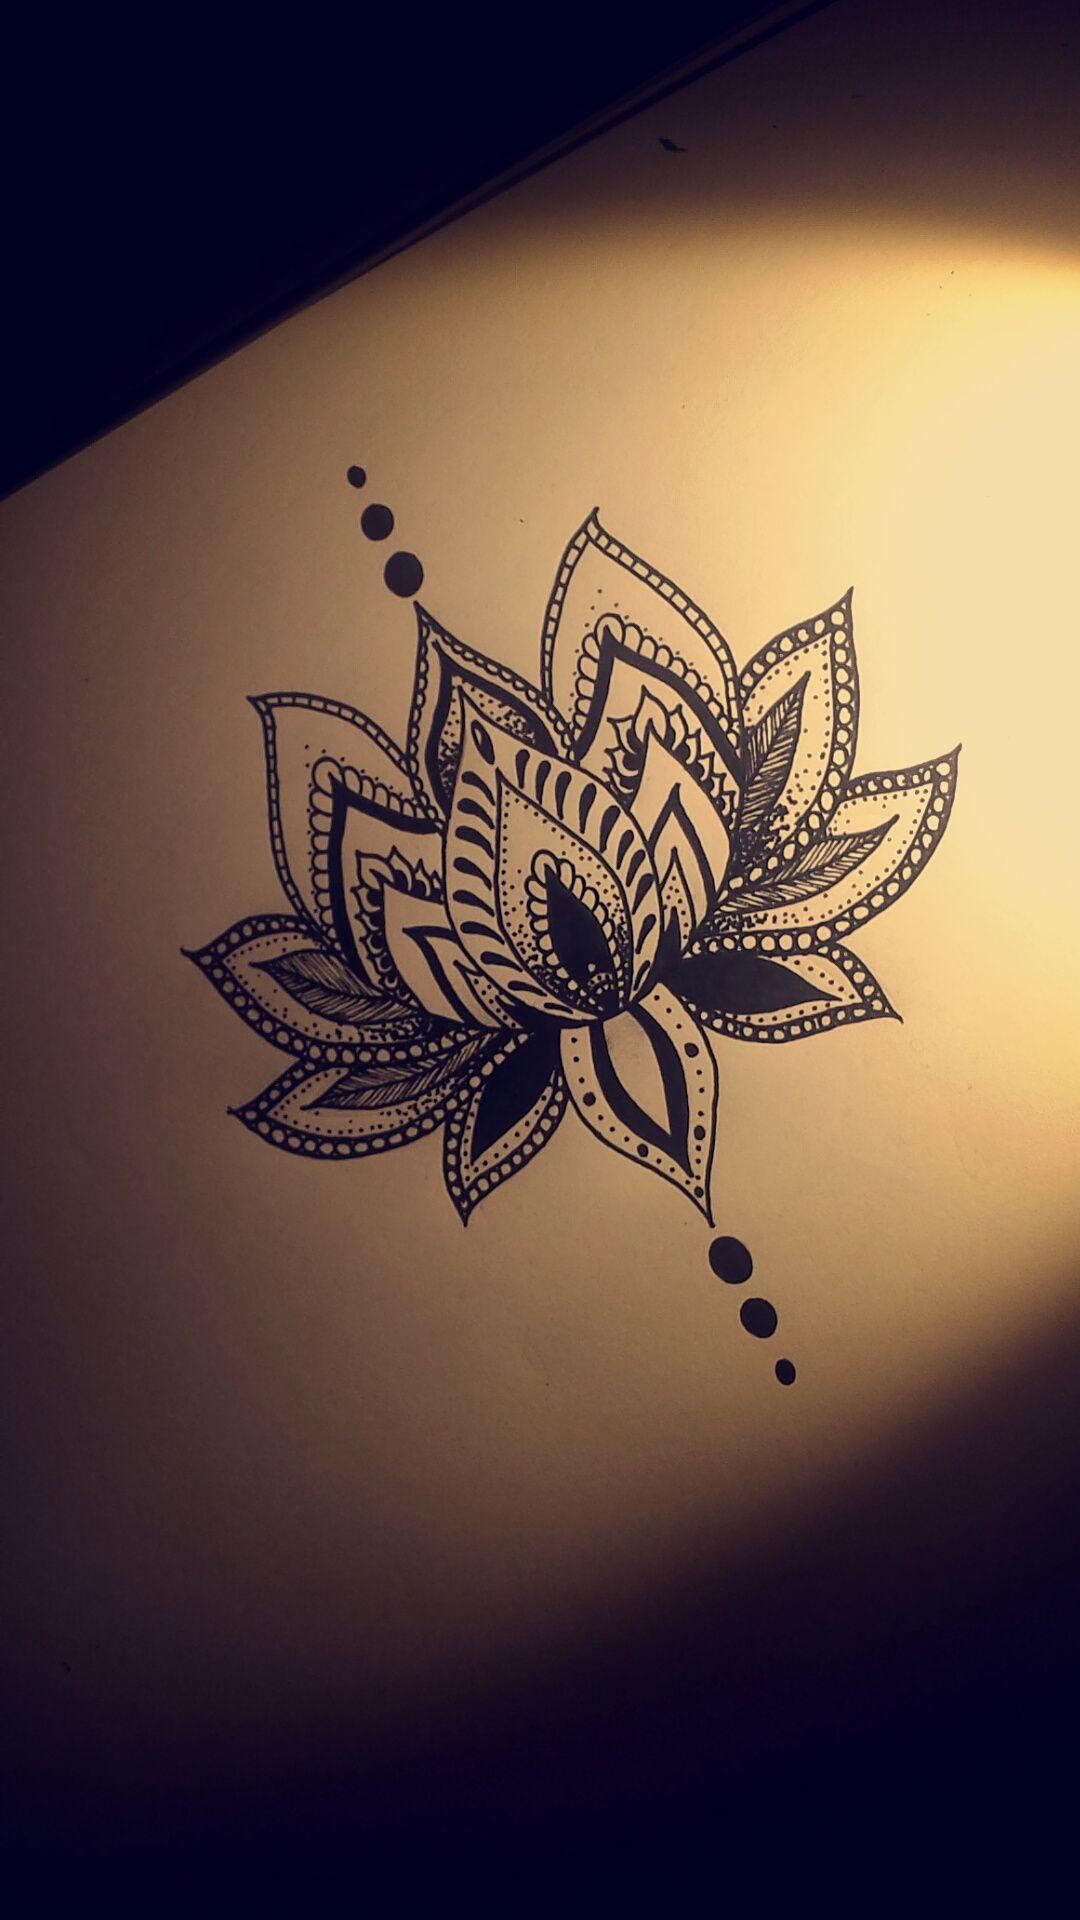 Blooming lotus designs women s - Lotus Flower Tattoo Design By Chawana Godwin